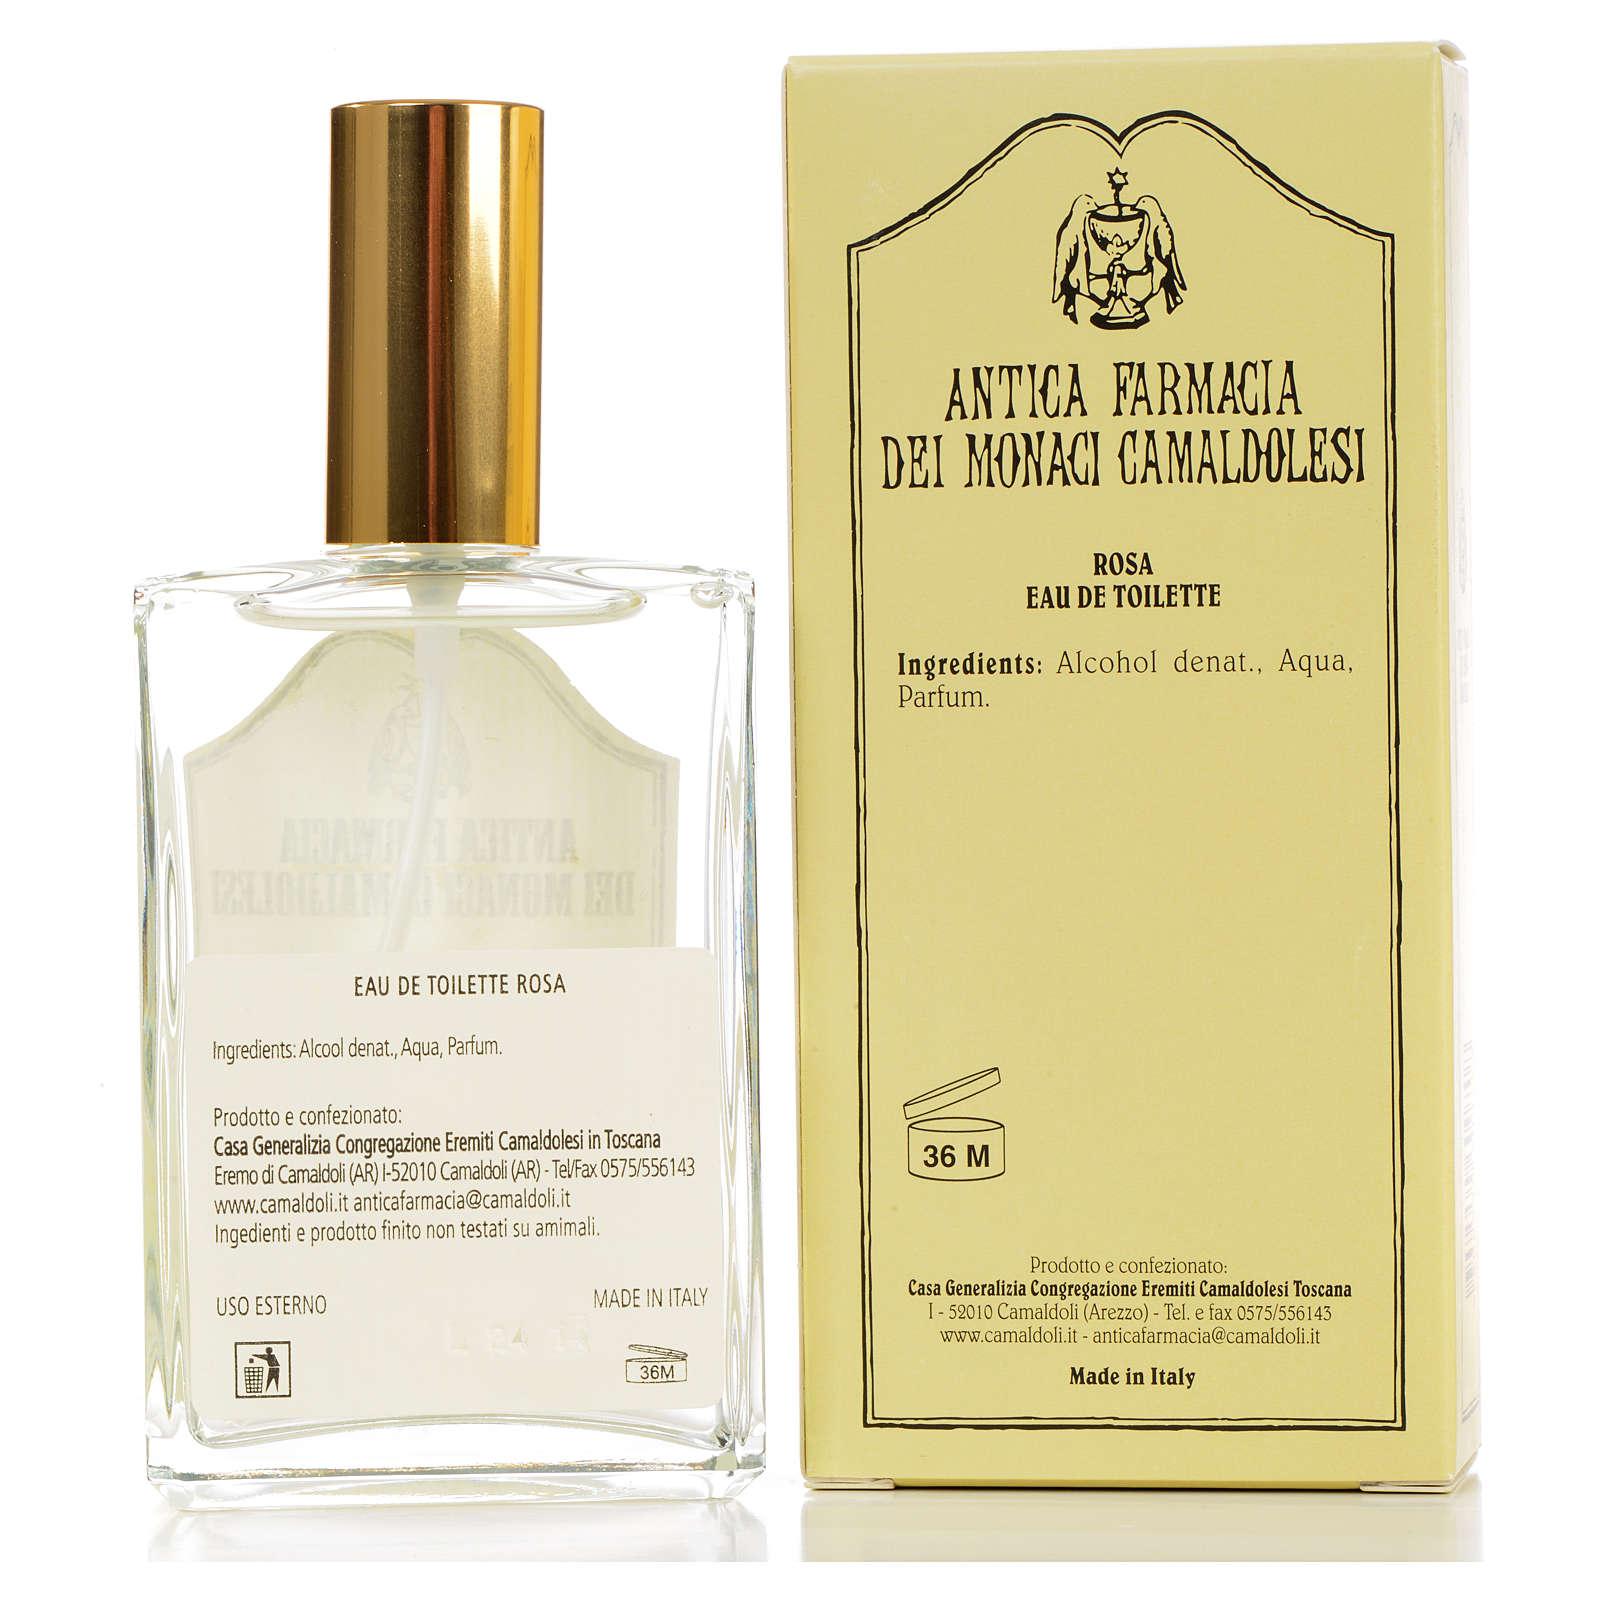 Agua de baño - Eau de Toilette Rosa  (100 ml) 4